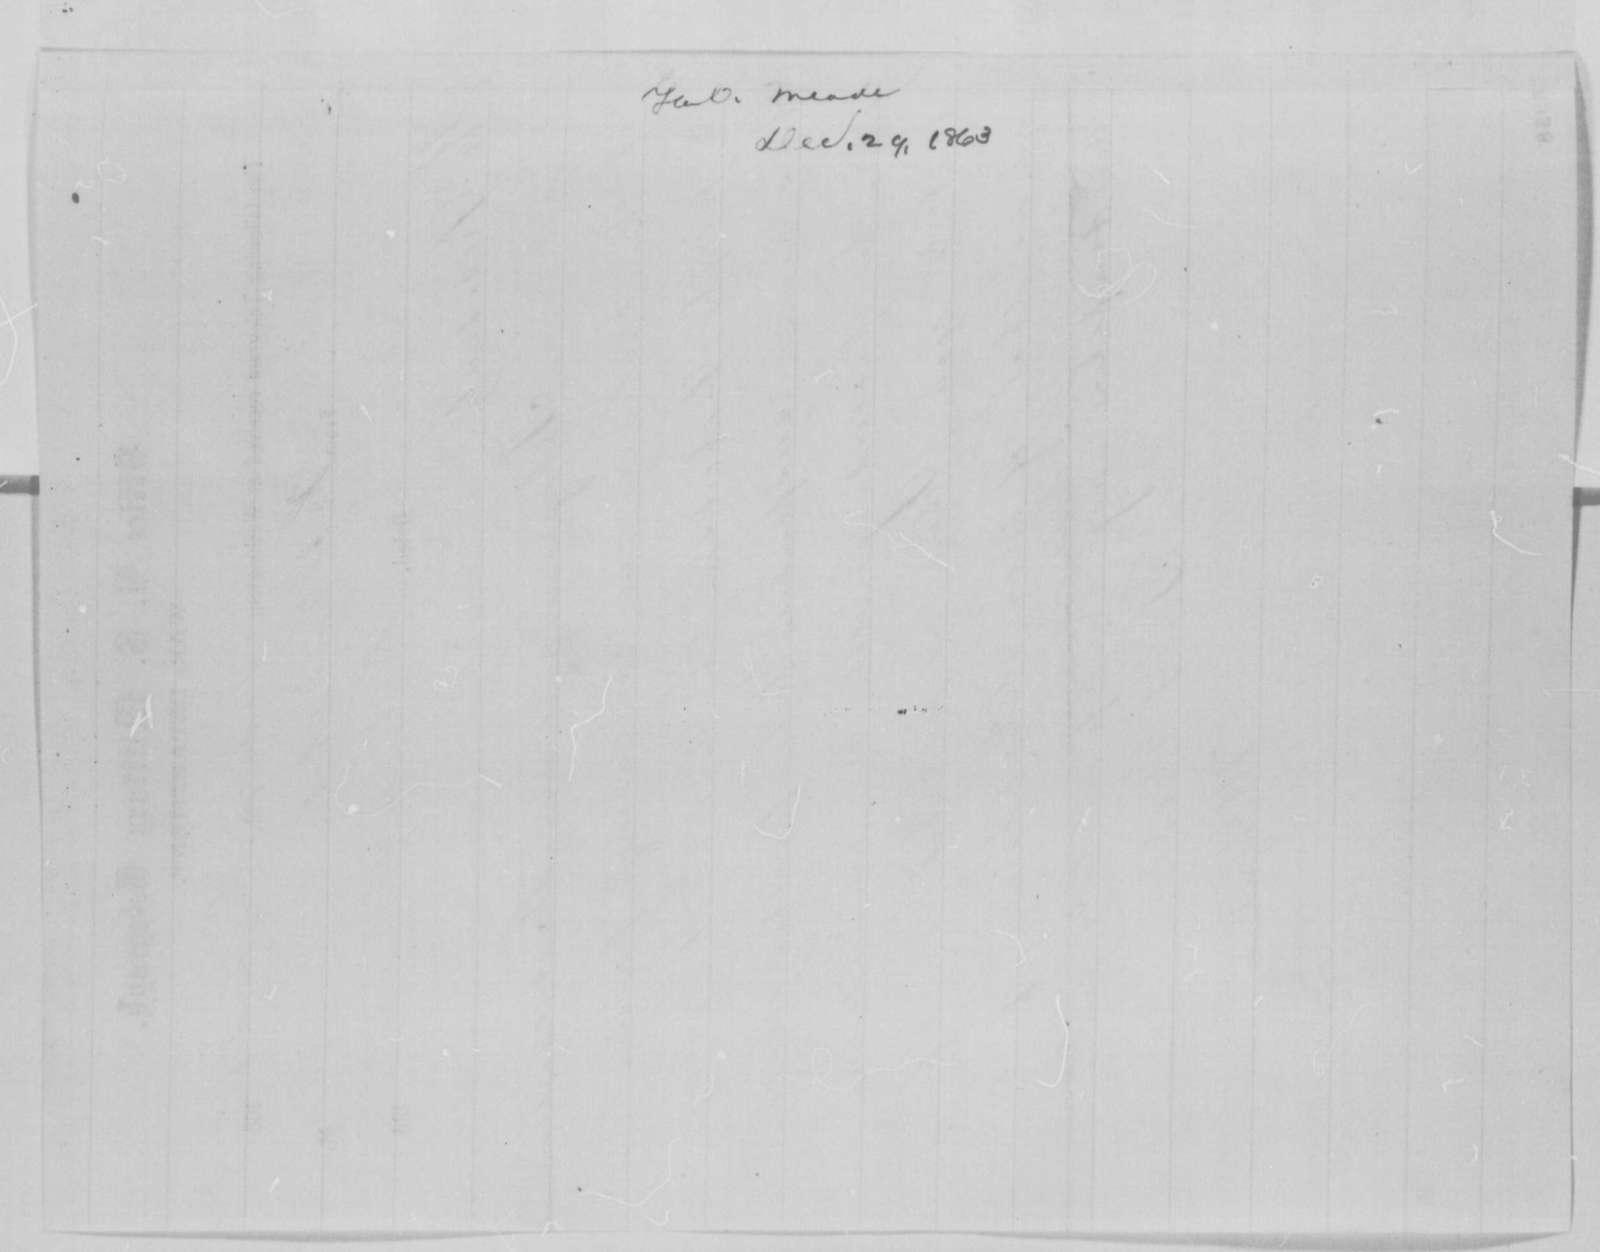 George G. Meade to Abraham Lincoln, Tuesday, December 29, 1863  (Telegram concerning case of Joseph Richardson)